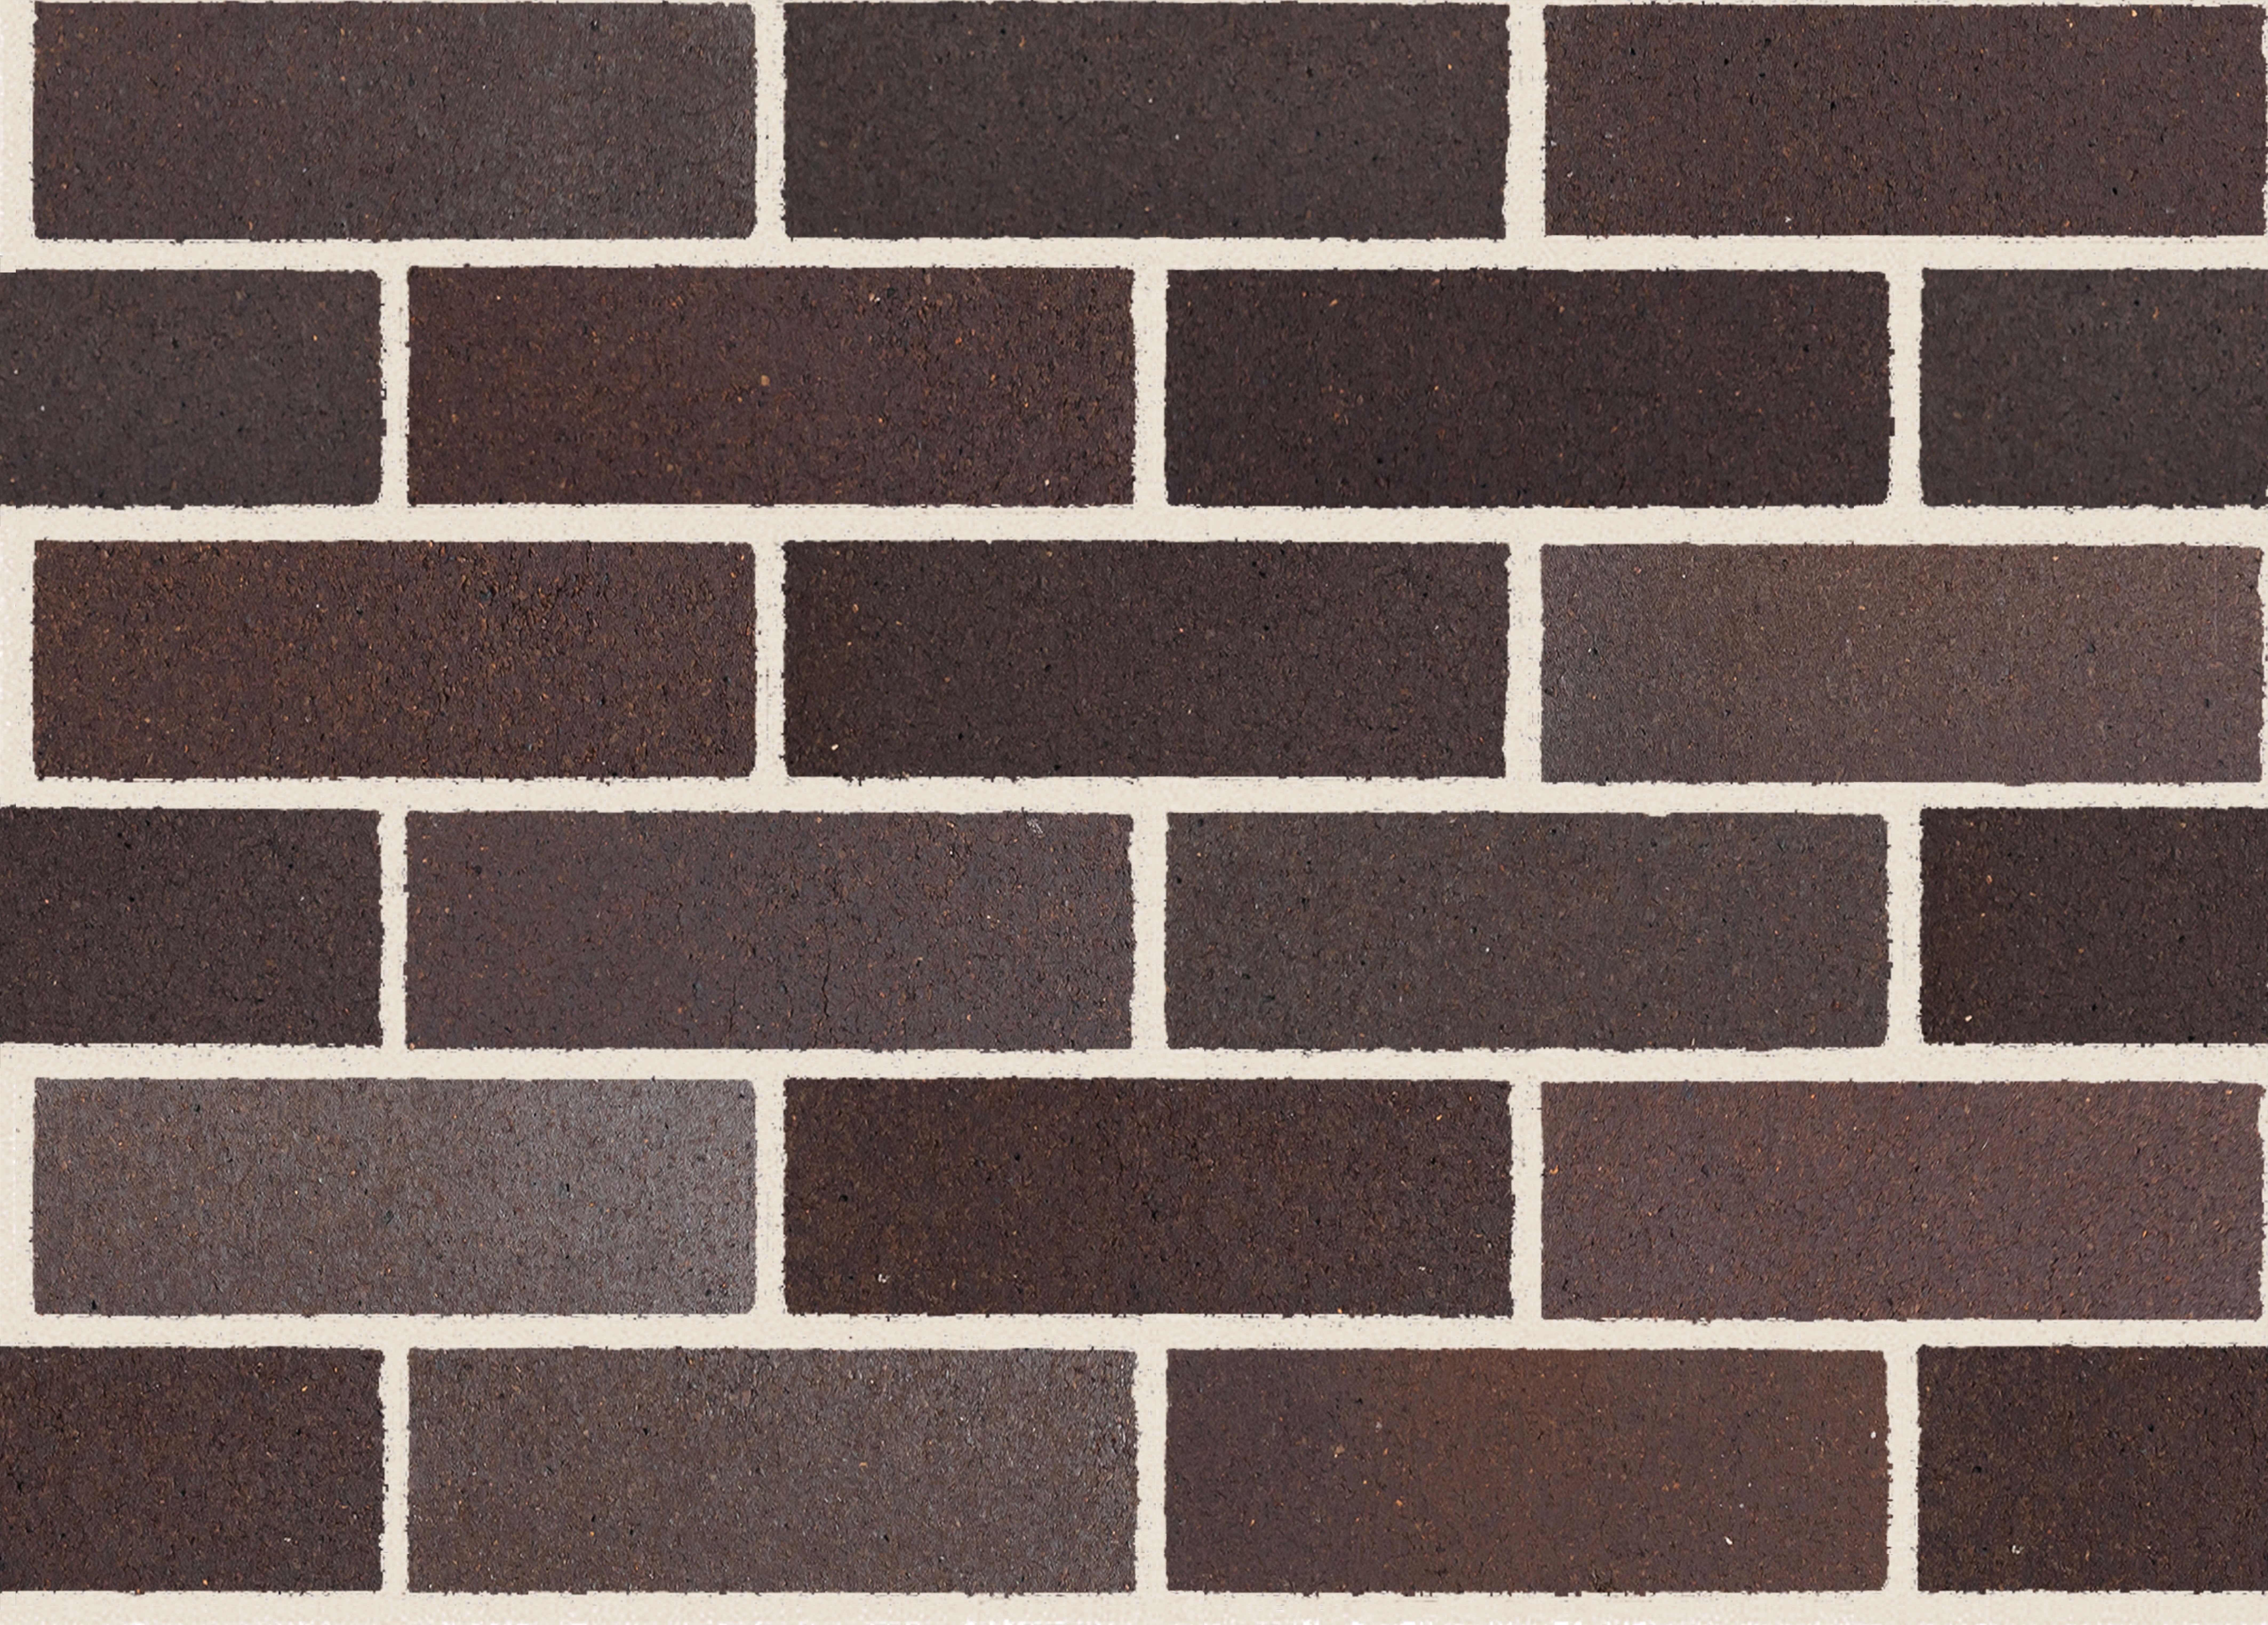 AB-Bricks-BowralBlue230x76-110-240-HiRes-NAT